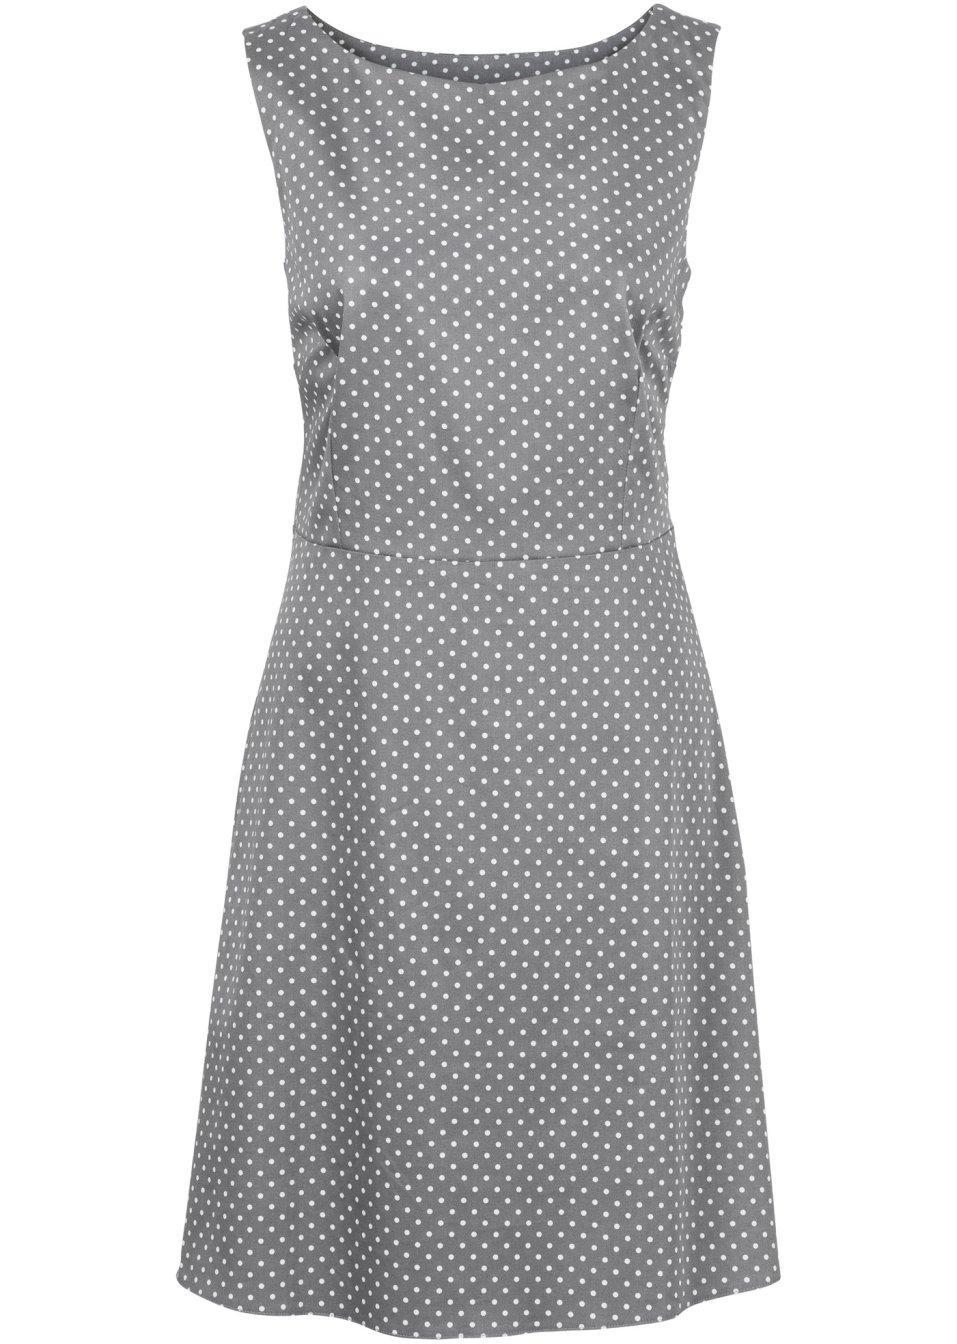 Kleid grau/weiss gepunktet - Damen - bonprix.ch